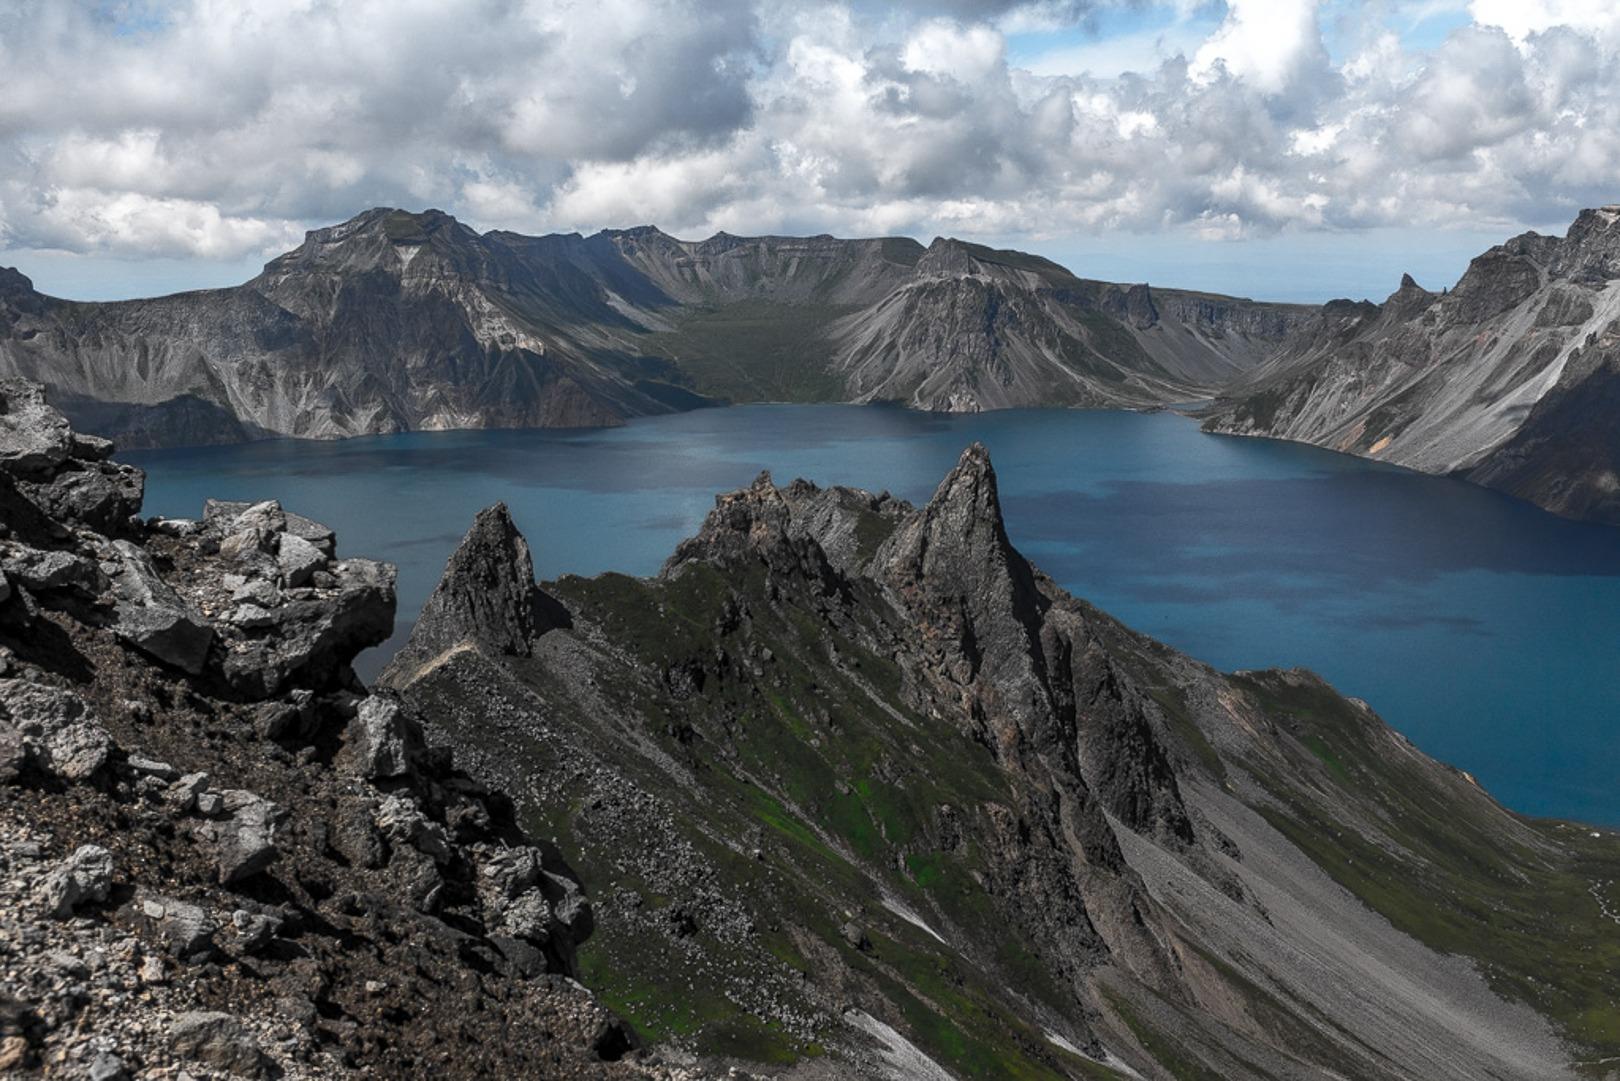 Paektusan is a sacred mountain in North Korea